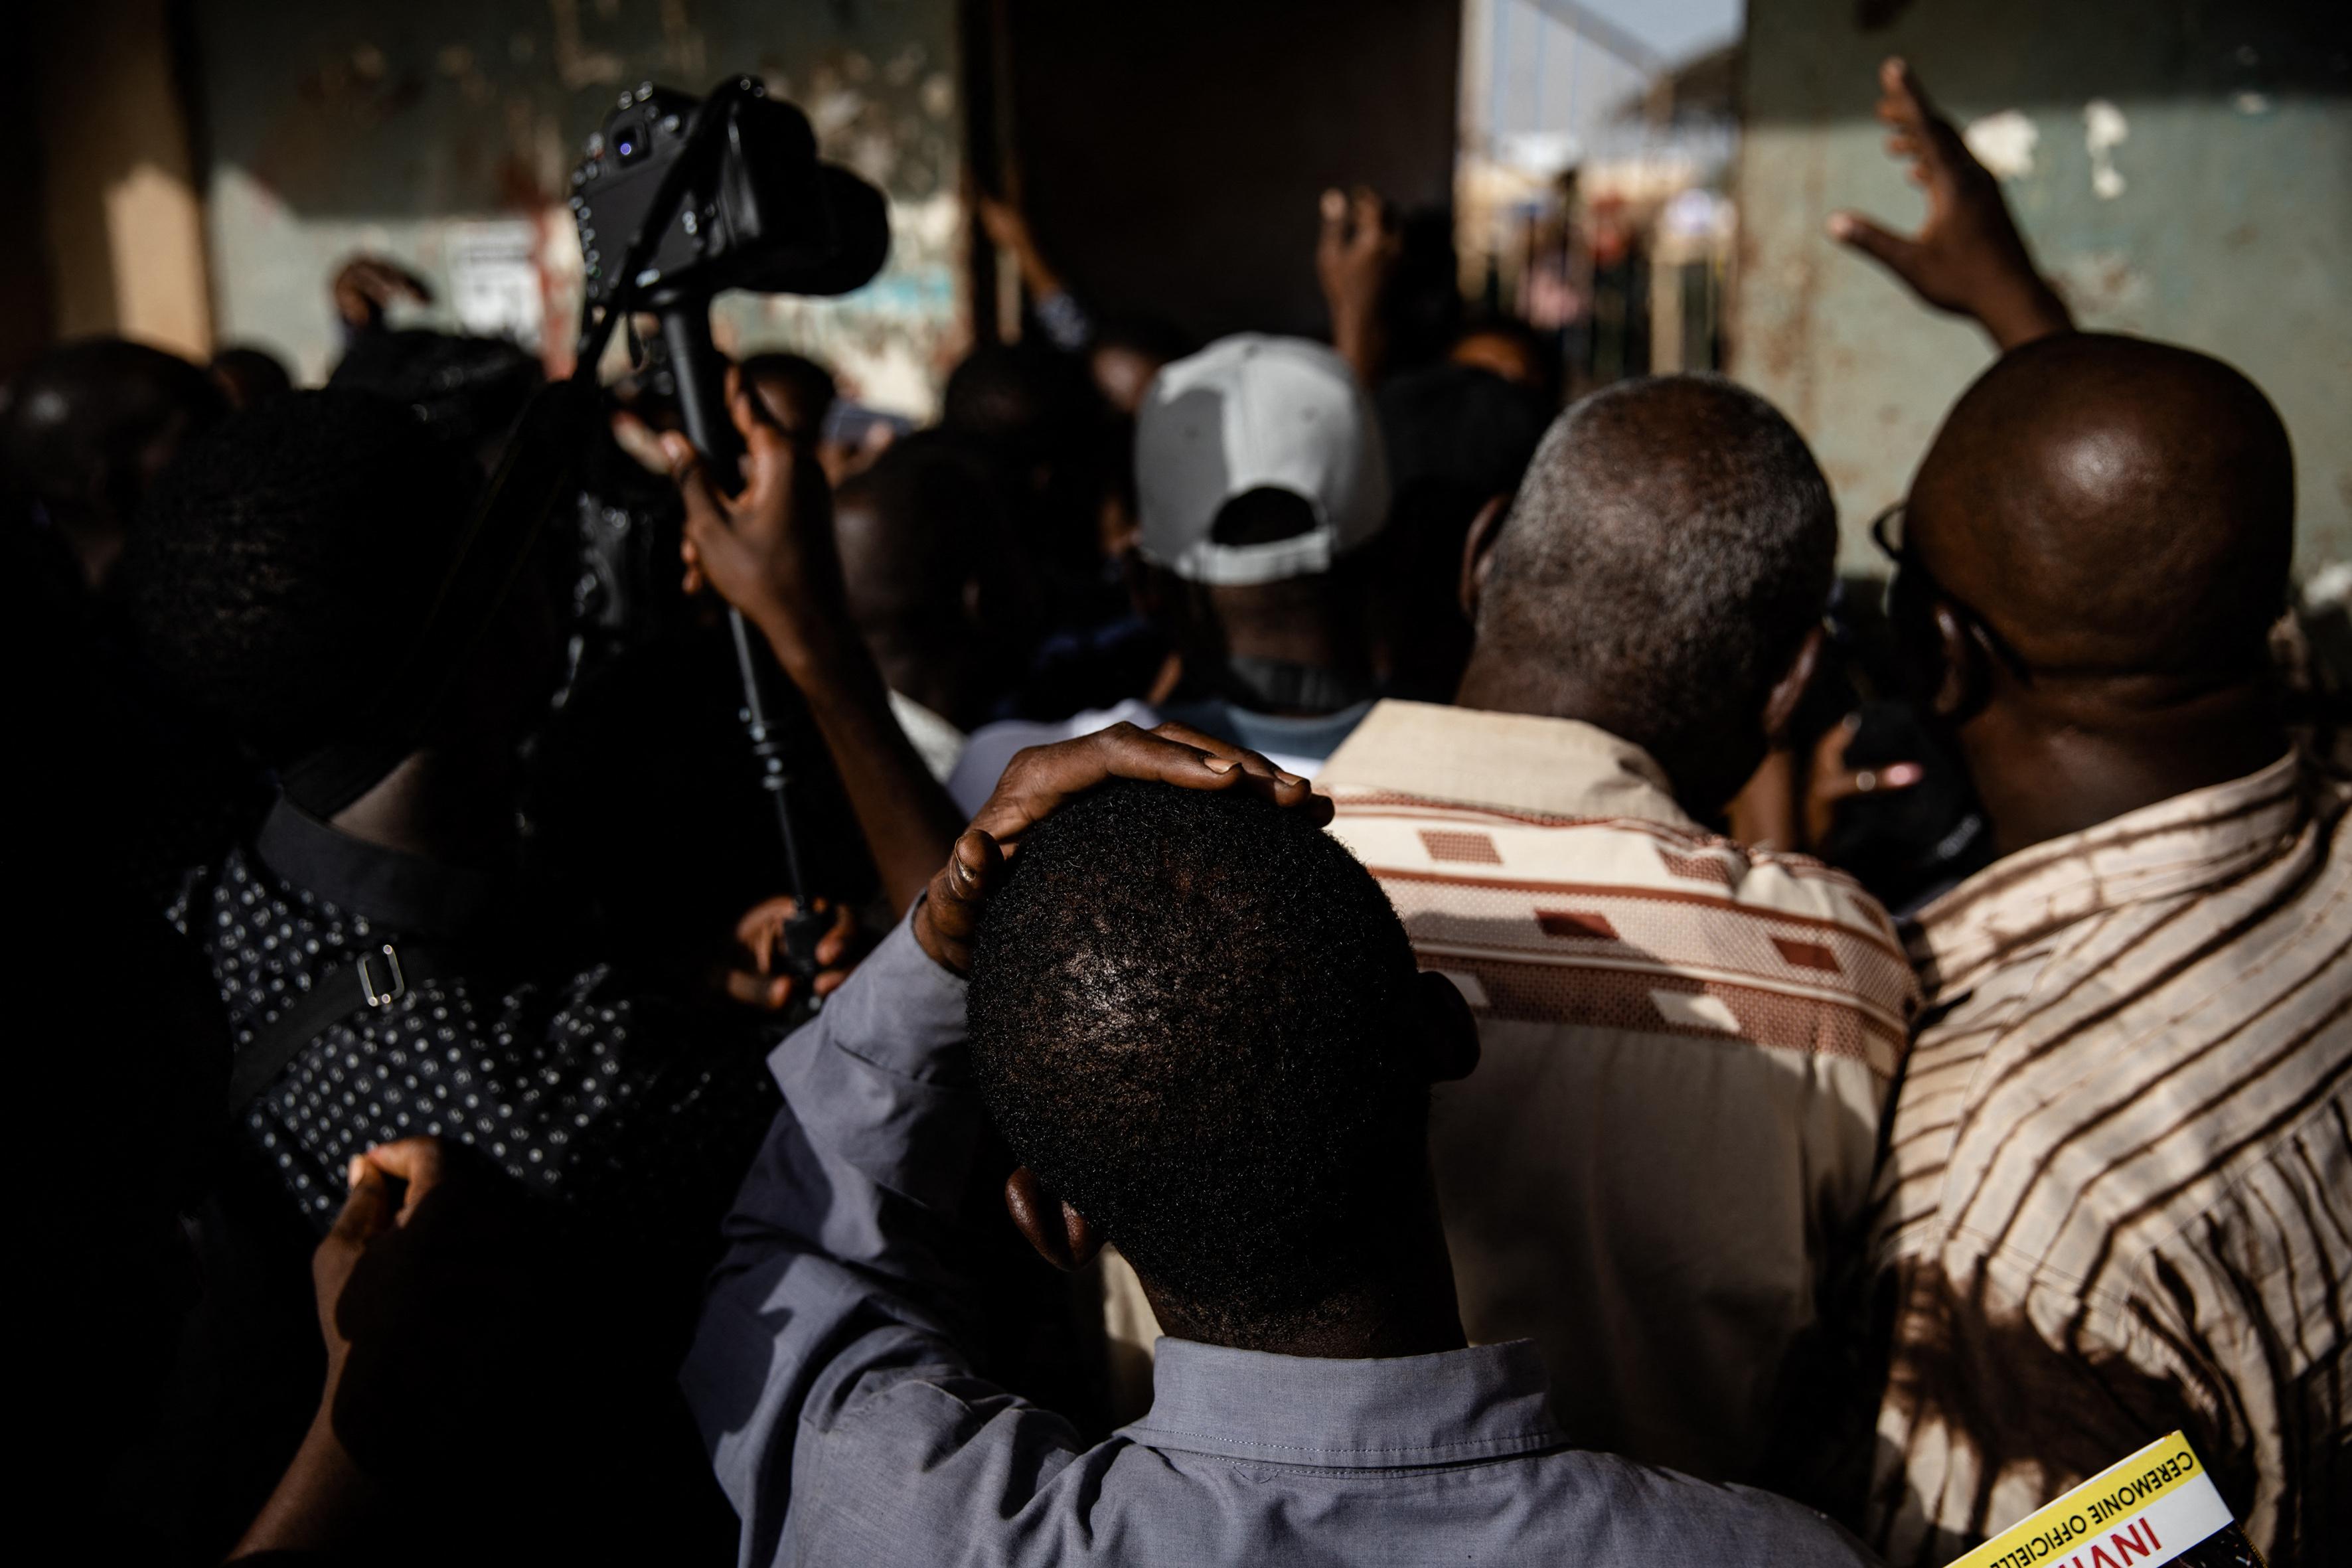 Cérémonie d'ouverture du FESPACO au Stade Municipal de Ouagadougou.